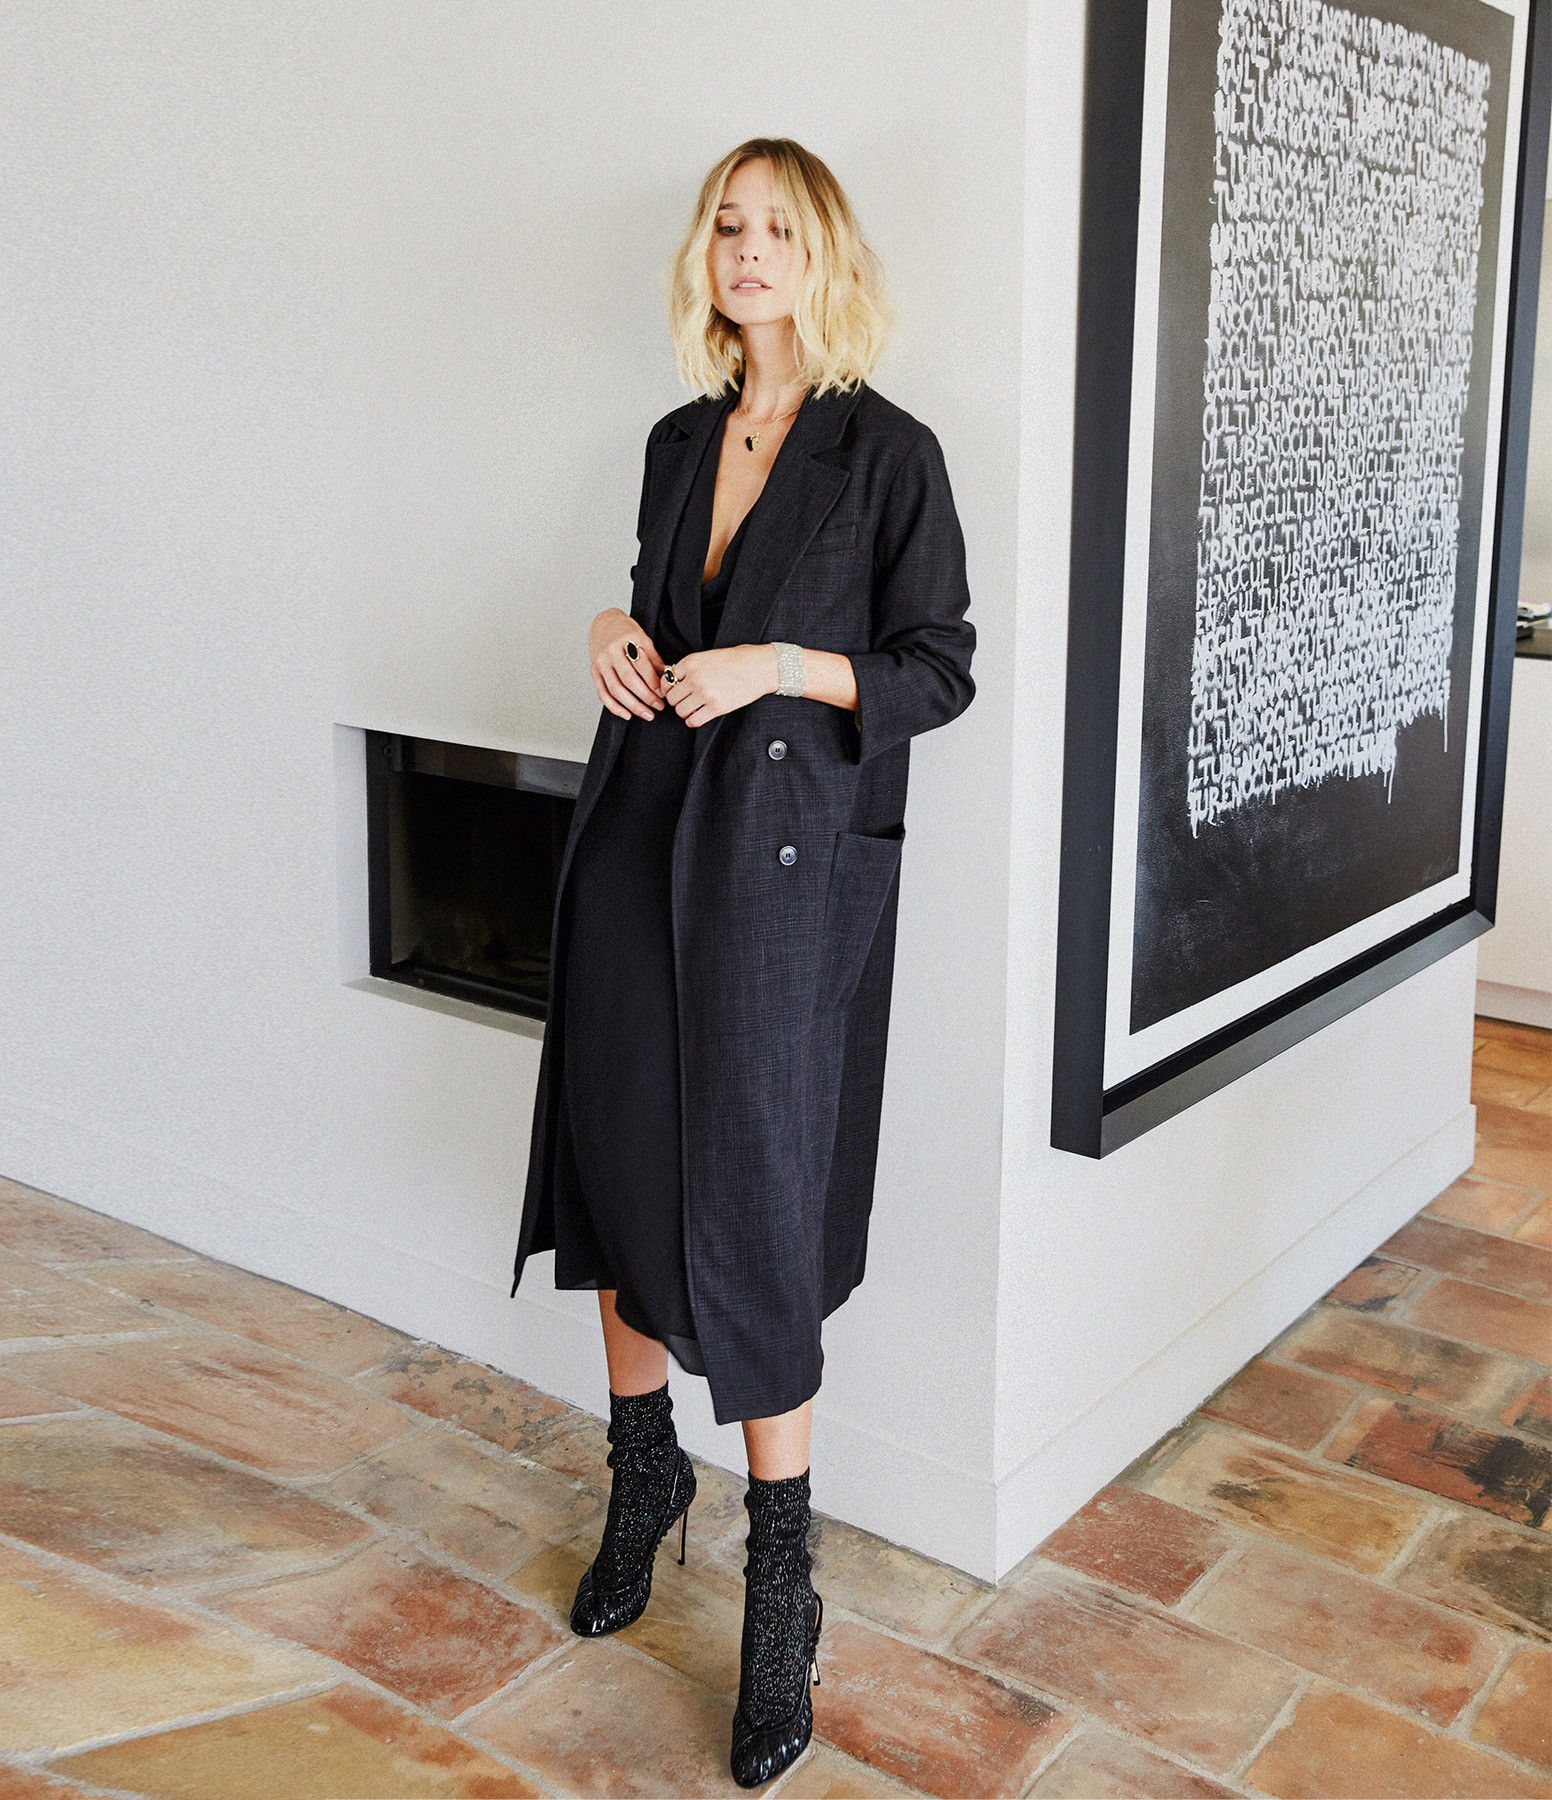 THEORY - Robe Longue Soie Noir